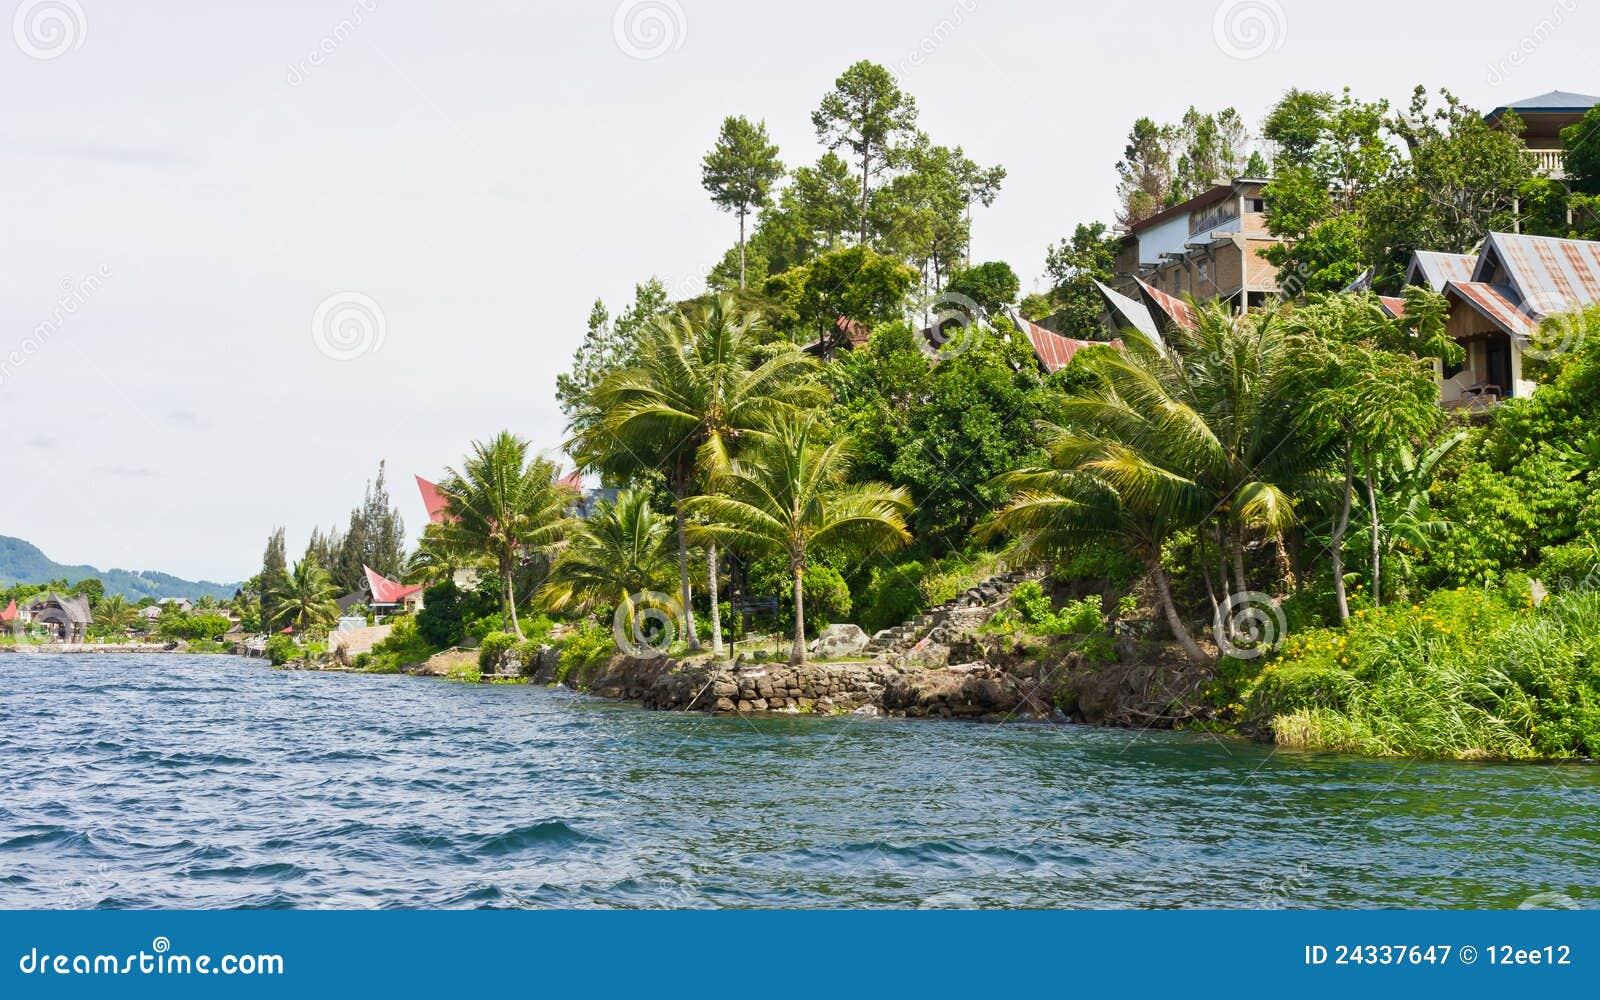 samosir-island-lake-toba-sumatra-24337647 Palm House Plans on pond plans, pagoda plans, wardian case plans, greenhouse plans, park plans, pavilion plans, conservatory plans, garden plans, cathedral plans, tree plans,